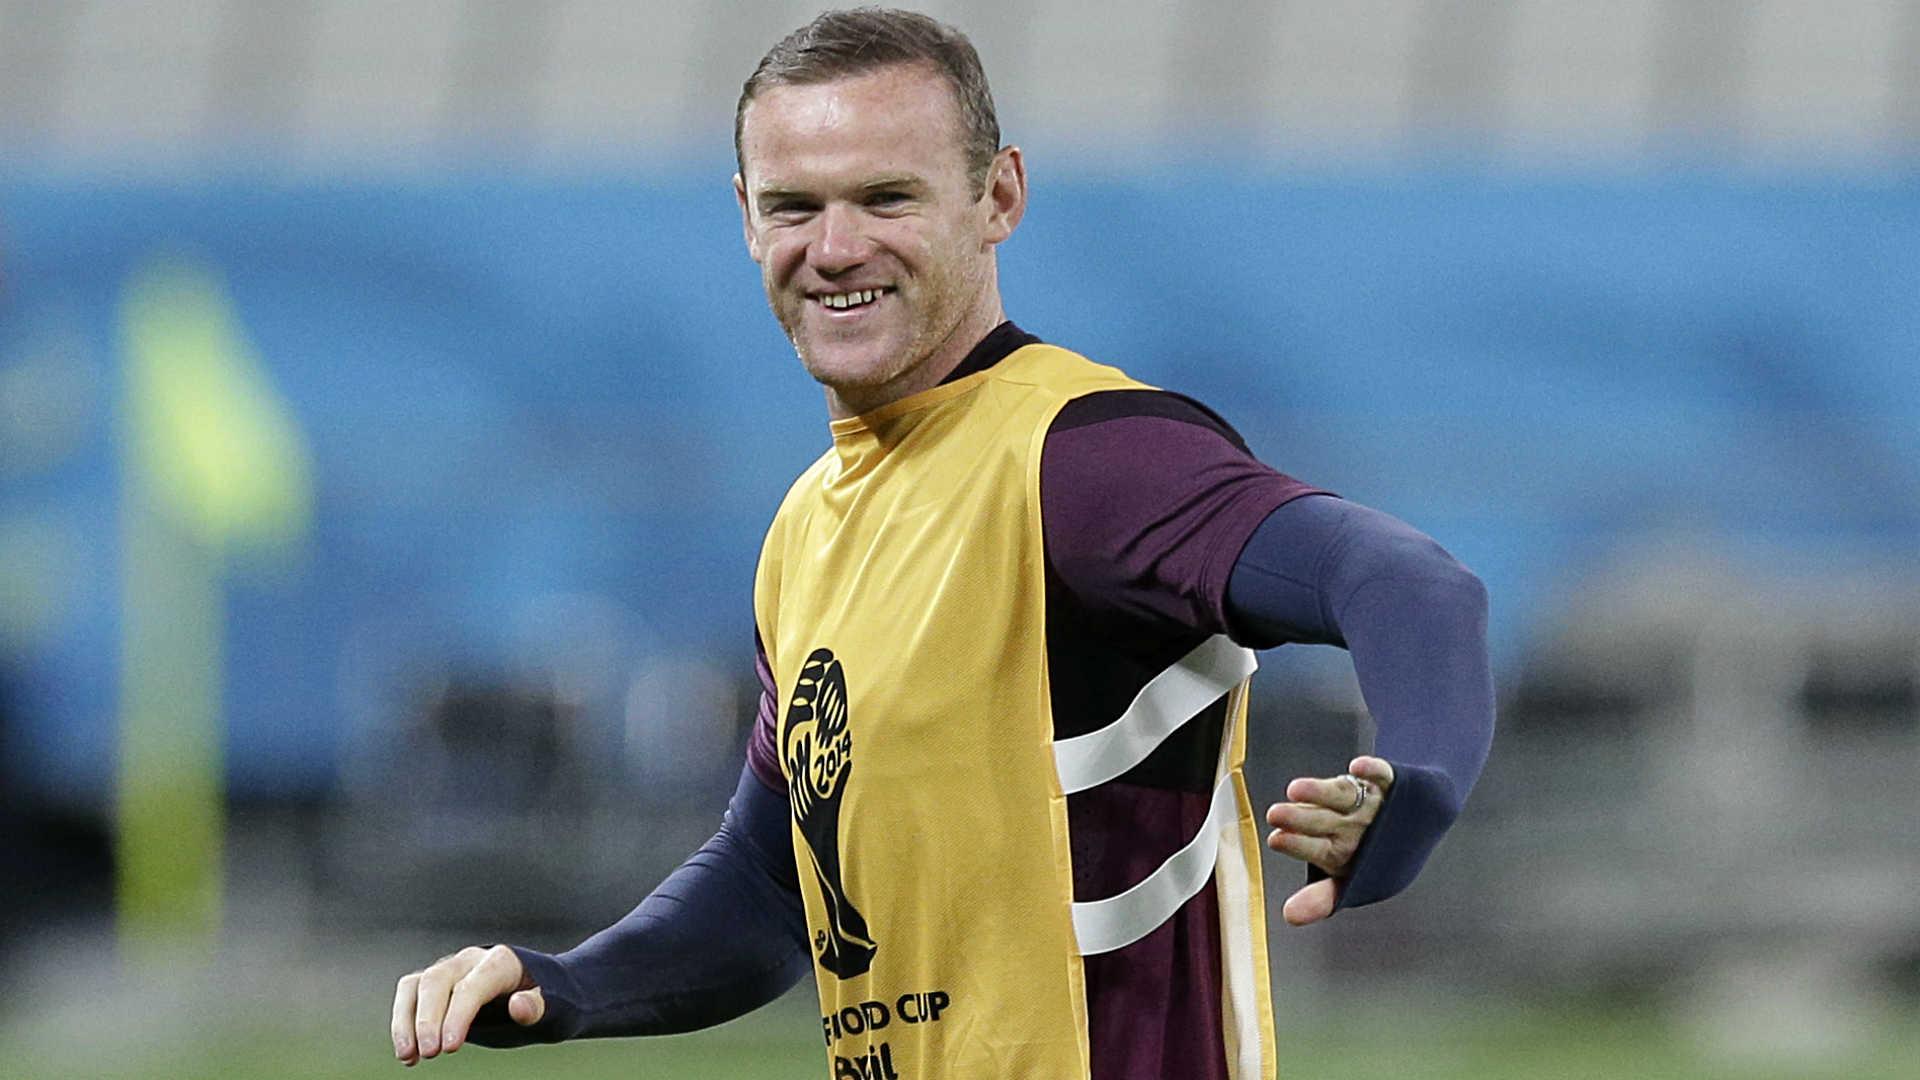 Wayne-Rooney-061814-AP-FTR.jpg